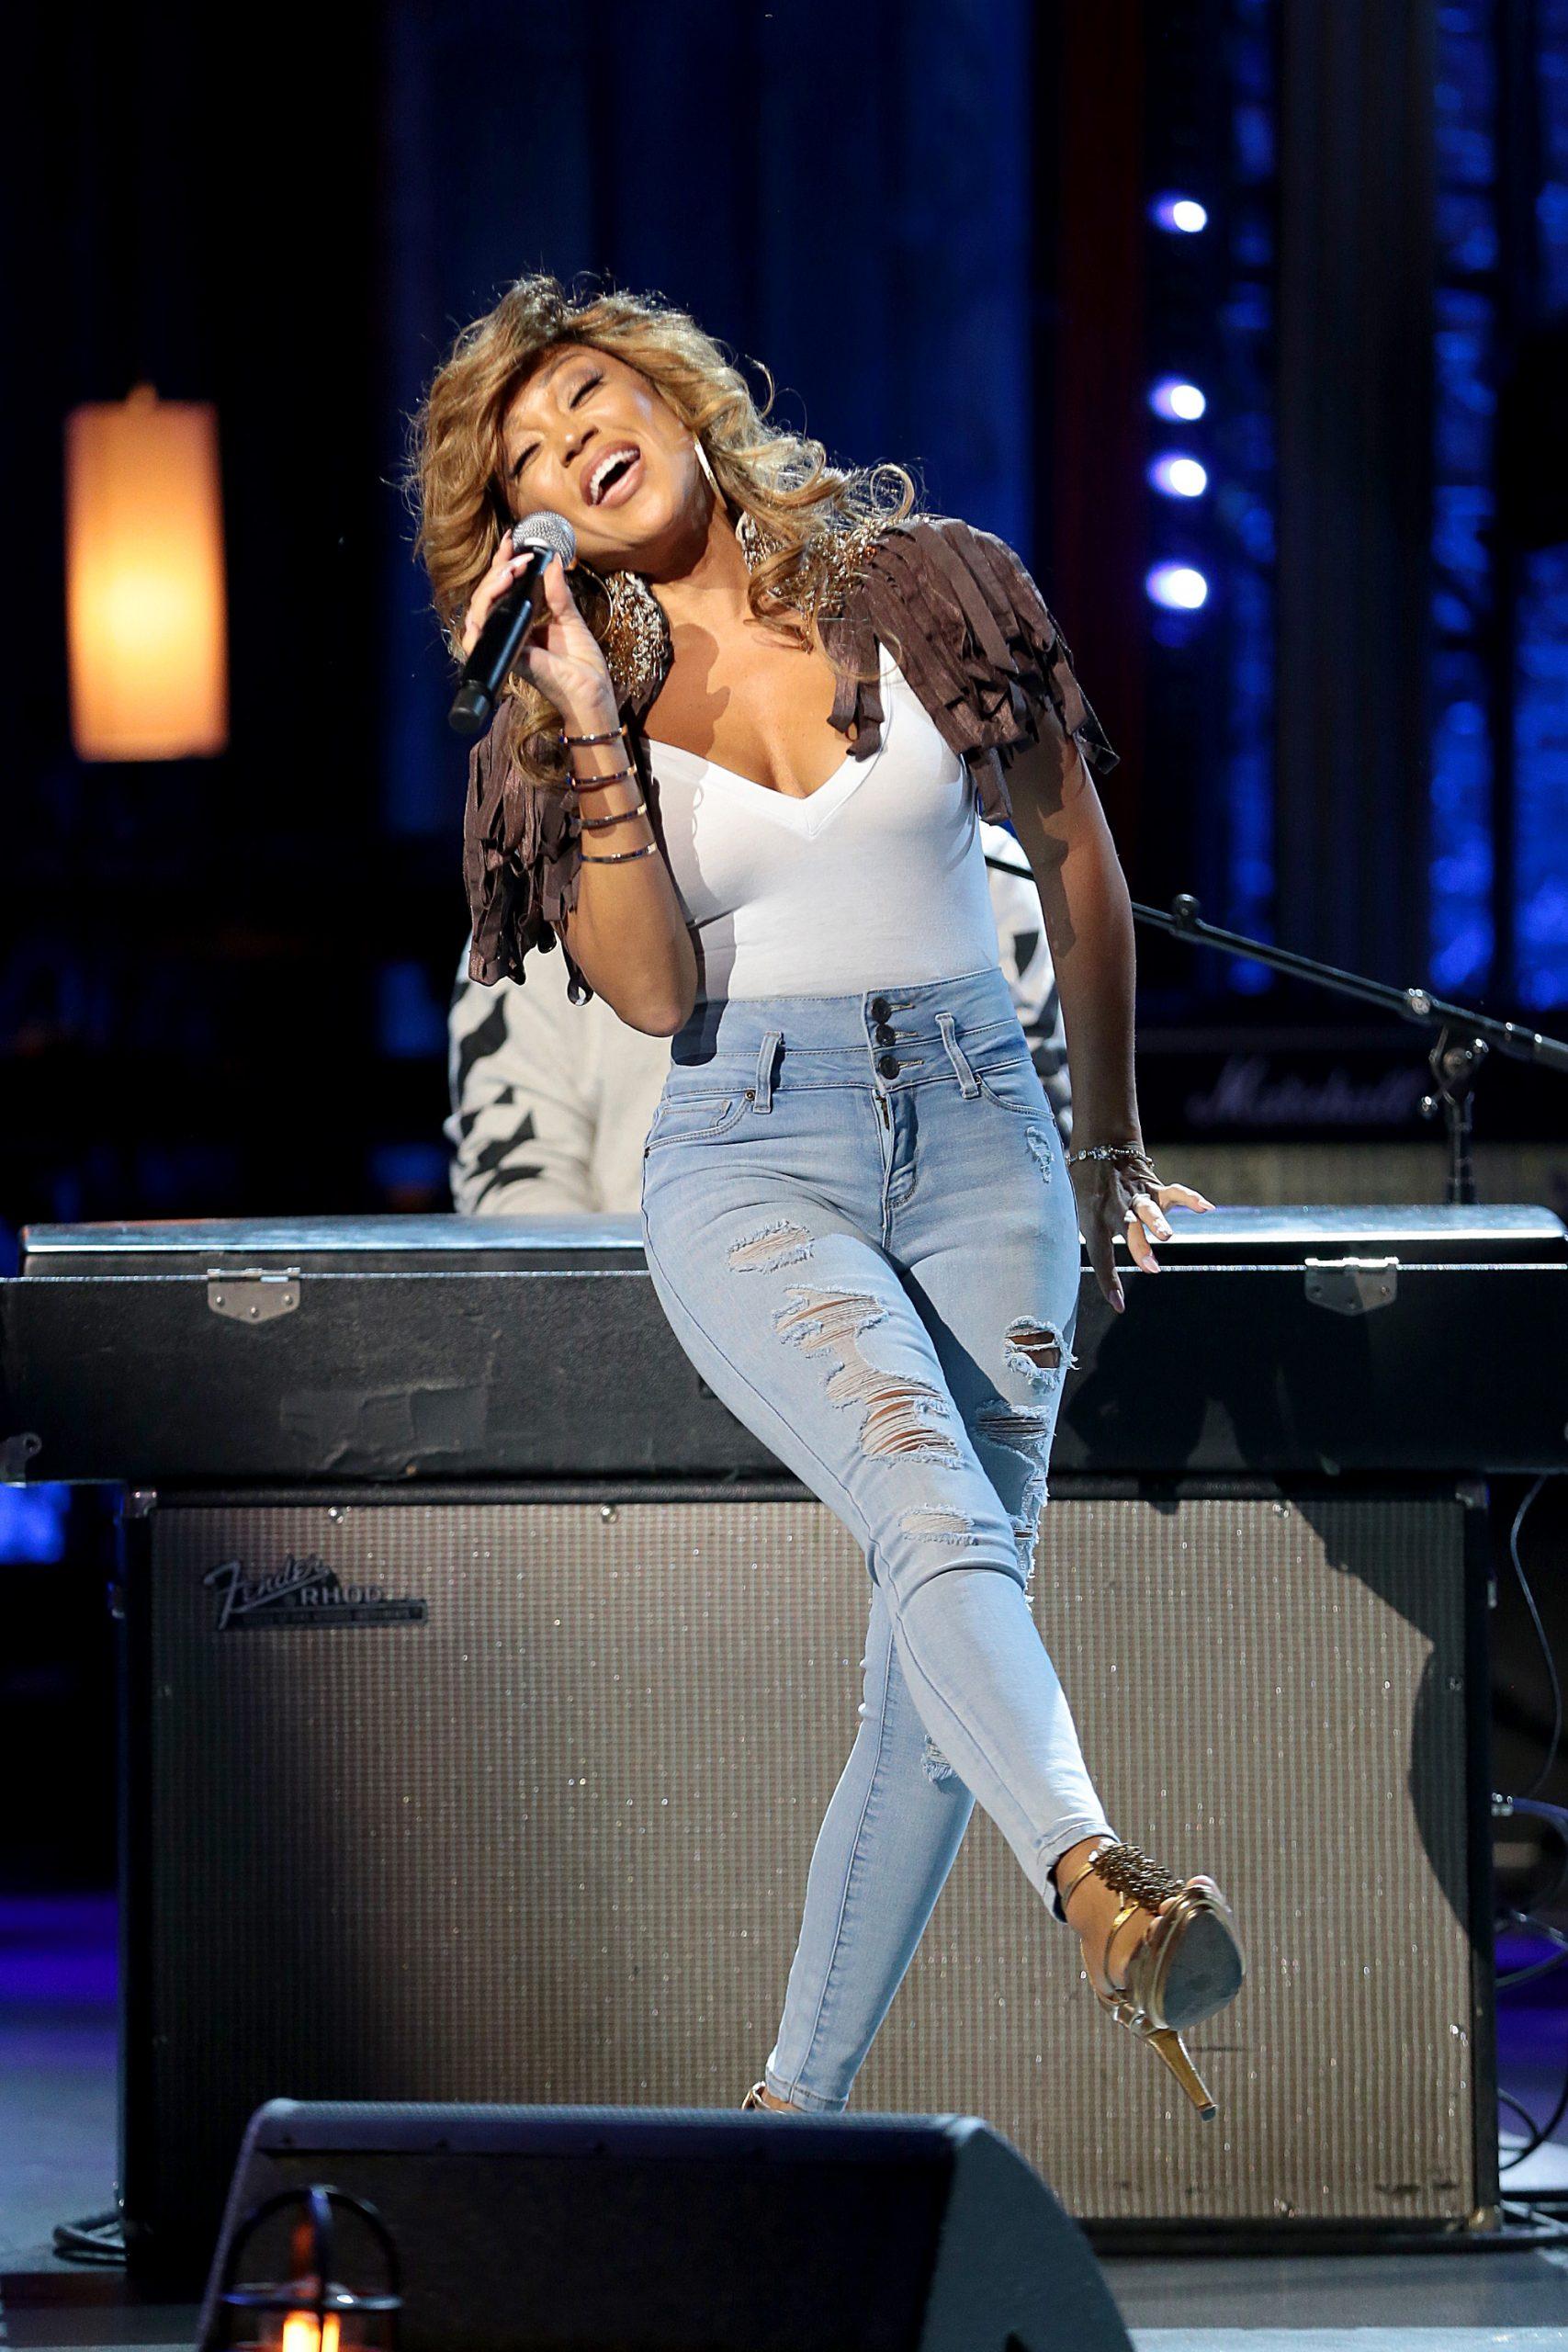 Recap: Soul Train Music Awards 2020 Hosted By Tisha Campbell & Tichina Arnold